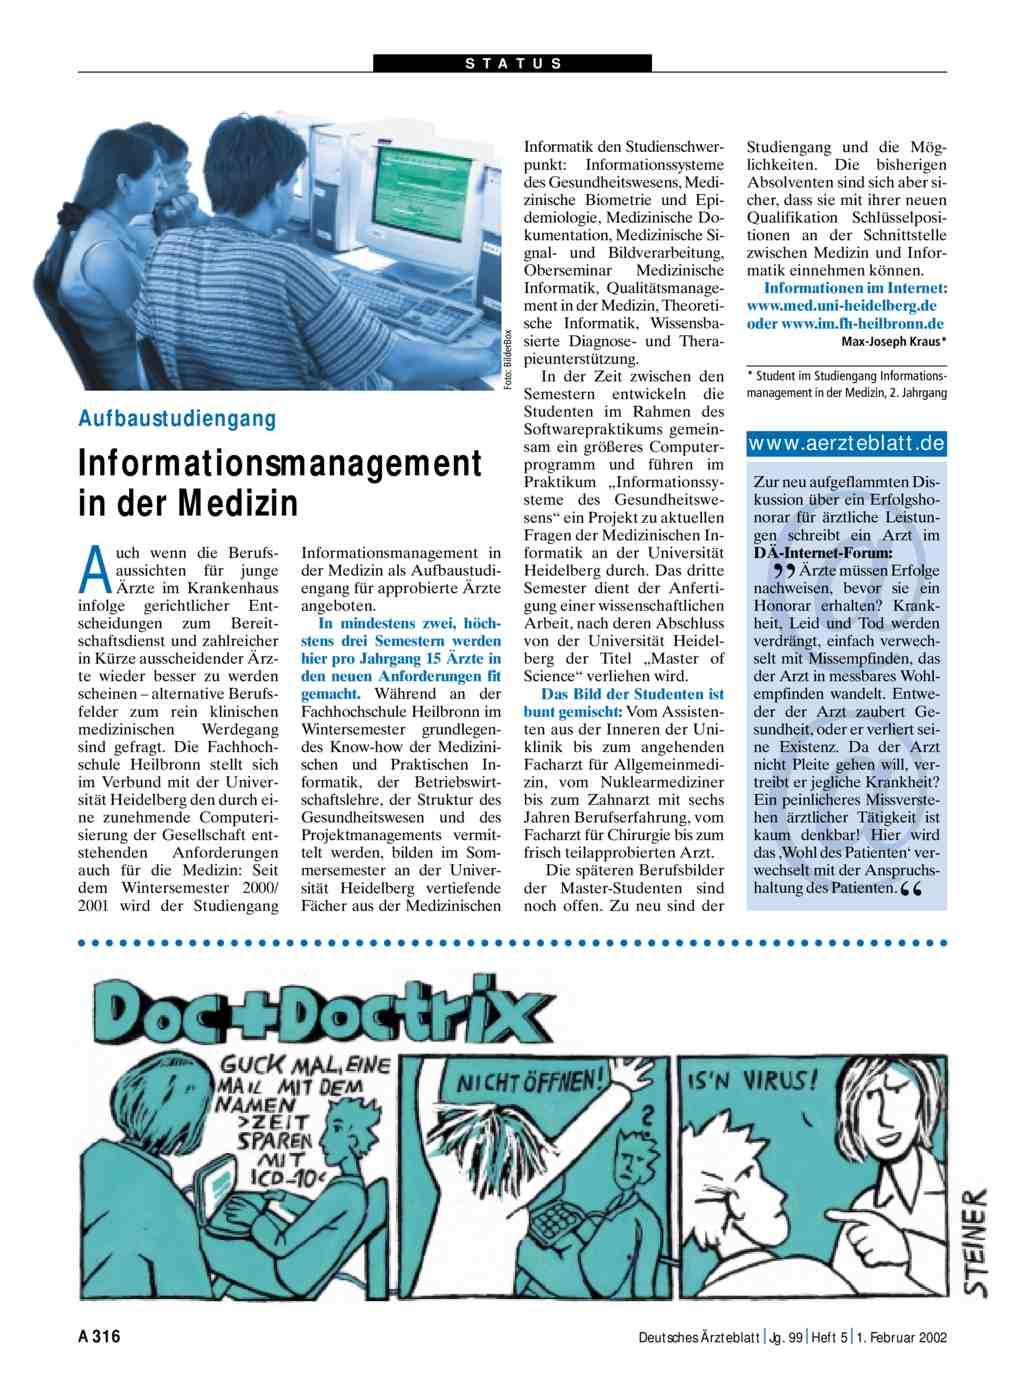 Aufbaustudiengang informationsmanagement in der medizin for Medizin studieren schweiz